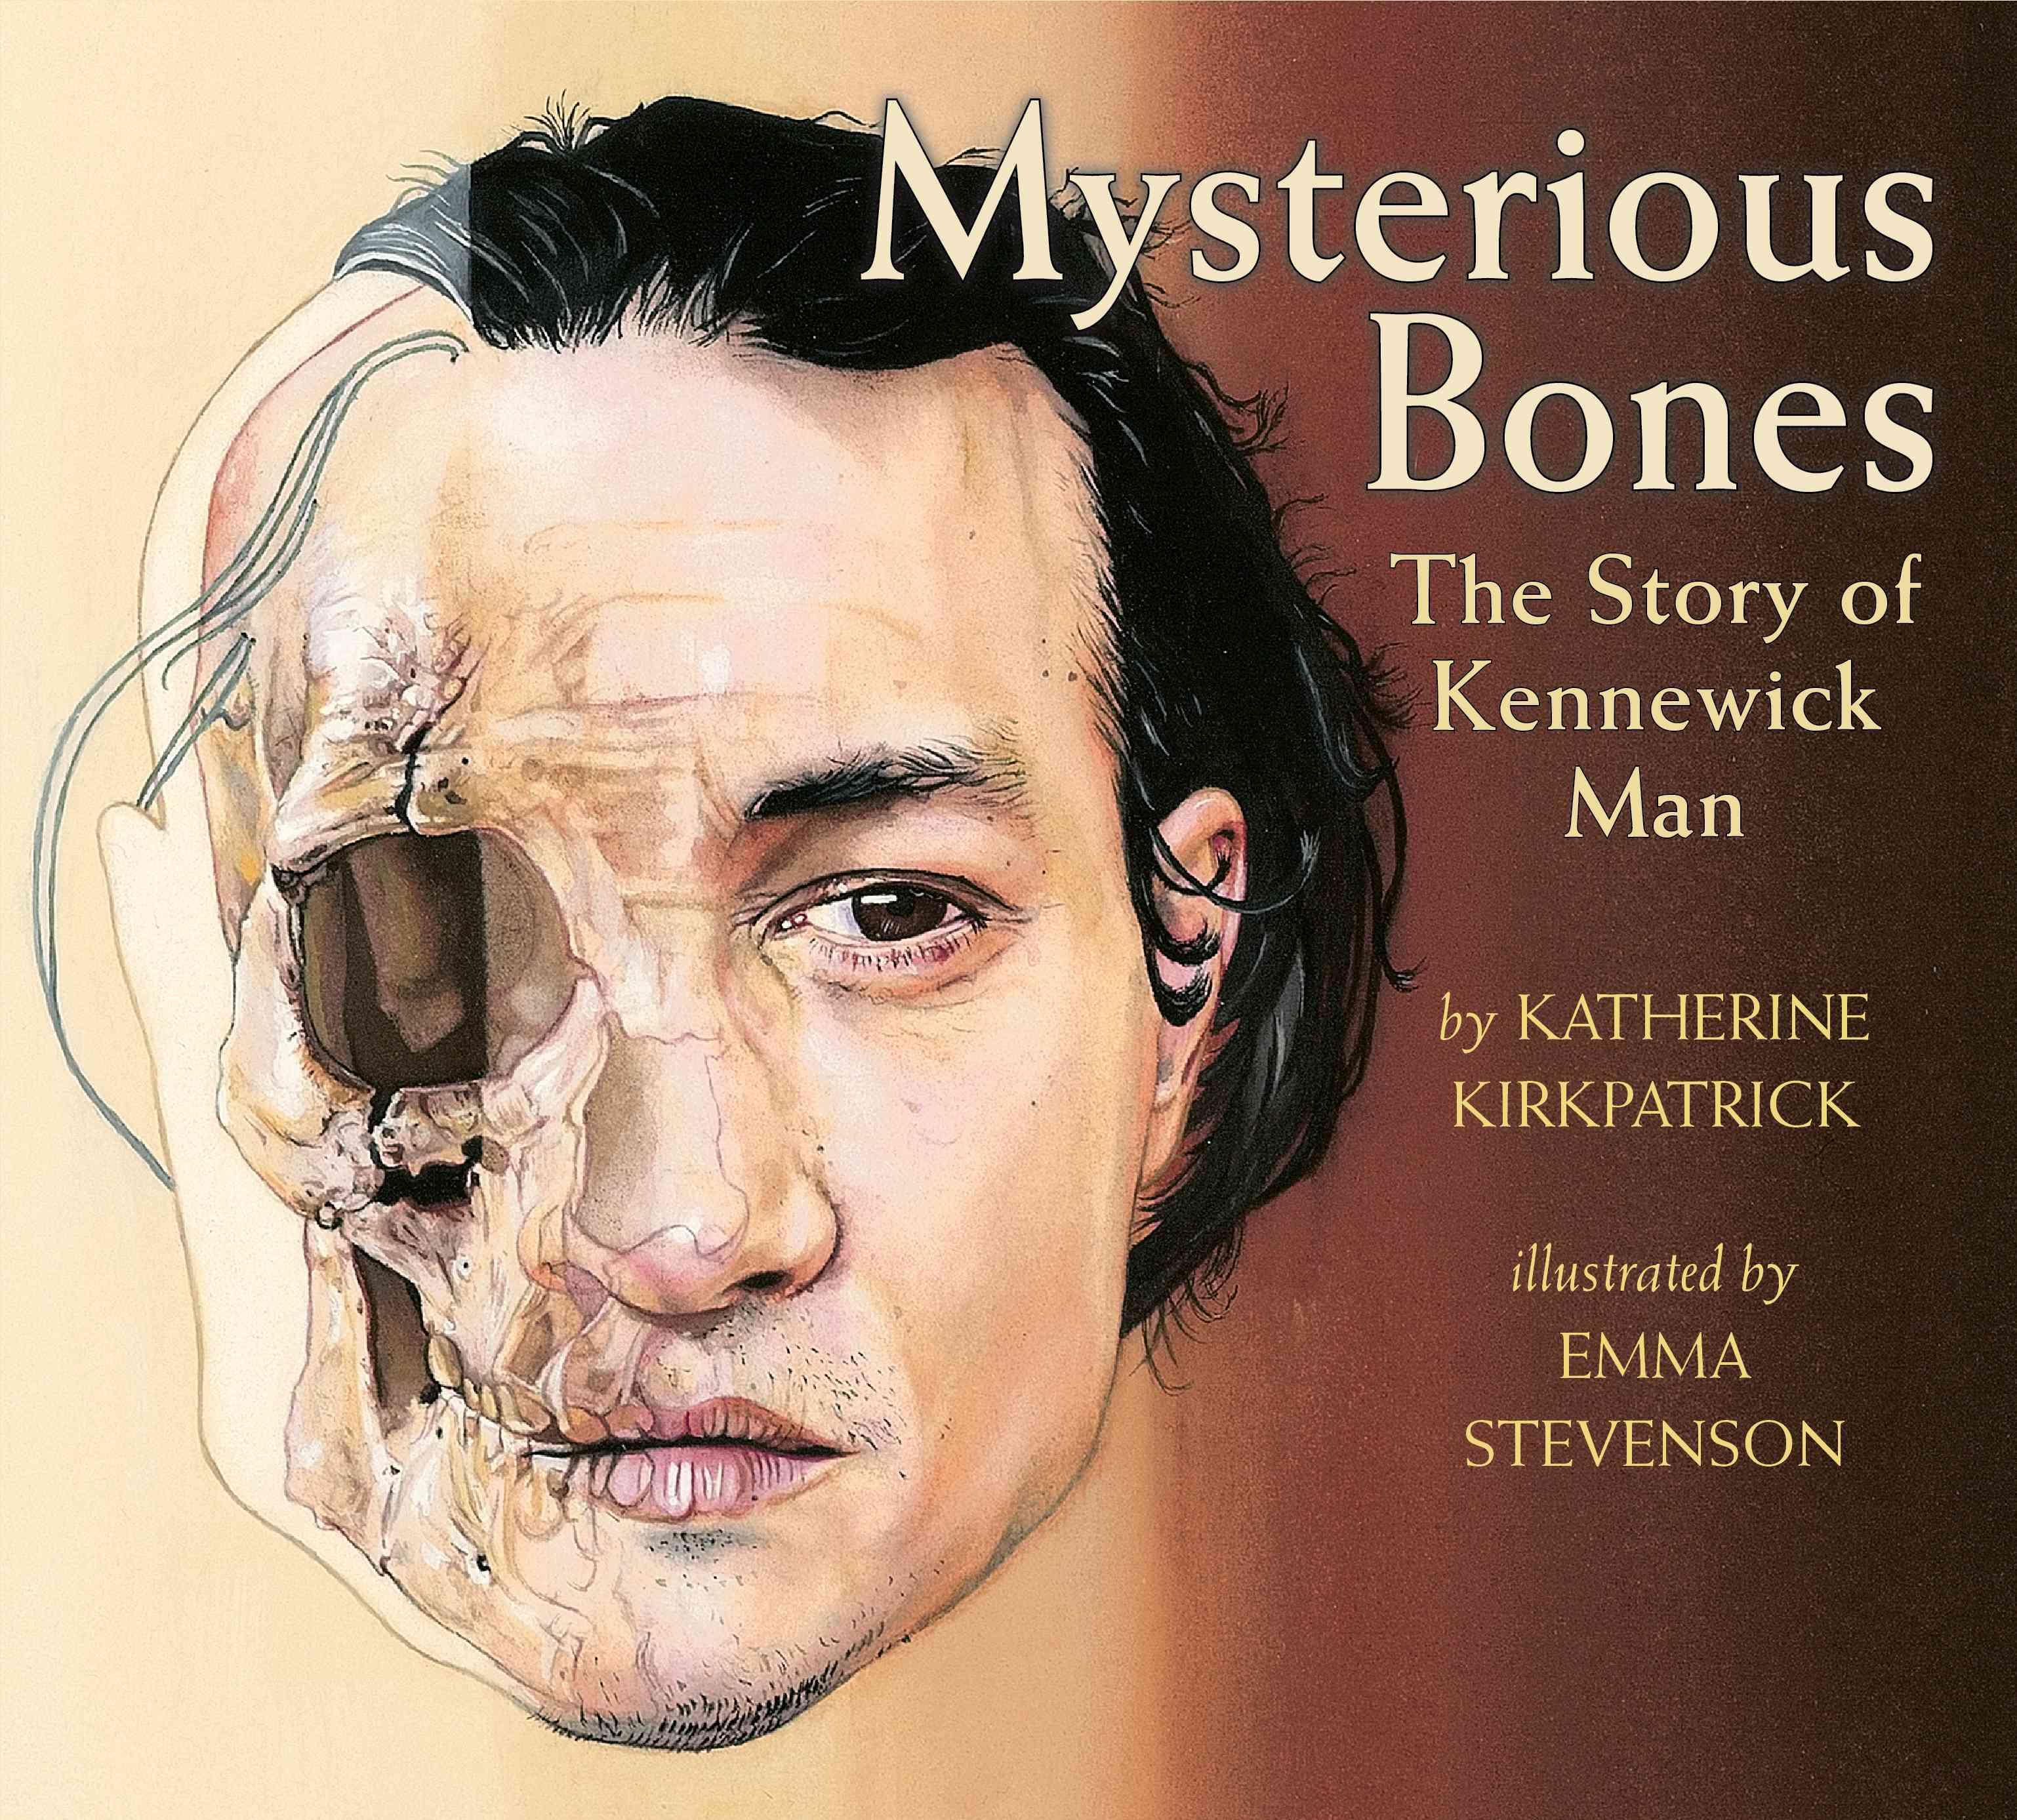 Mysterious Bones By Kirkpatrick, Katherine/ Stevenson, Emma (ILT)